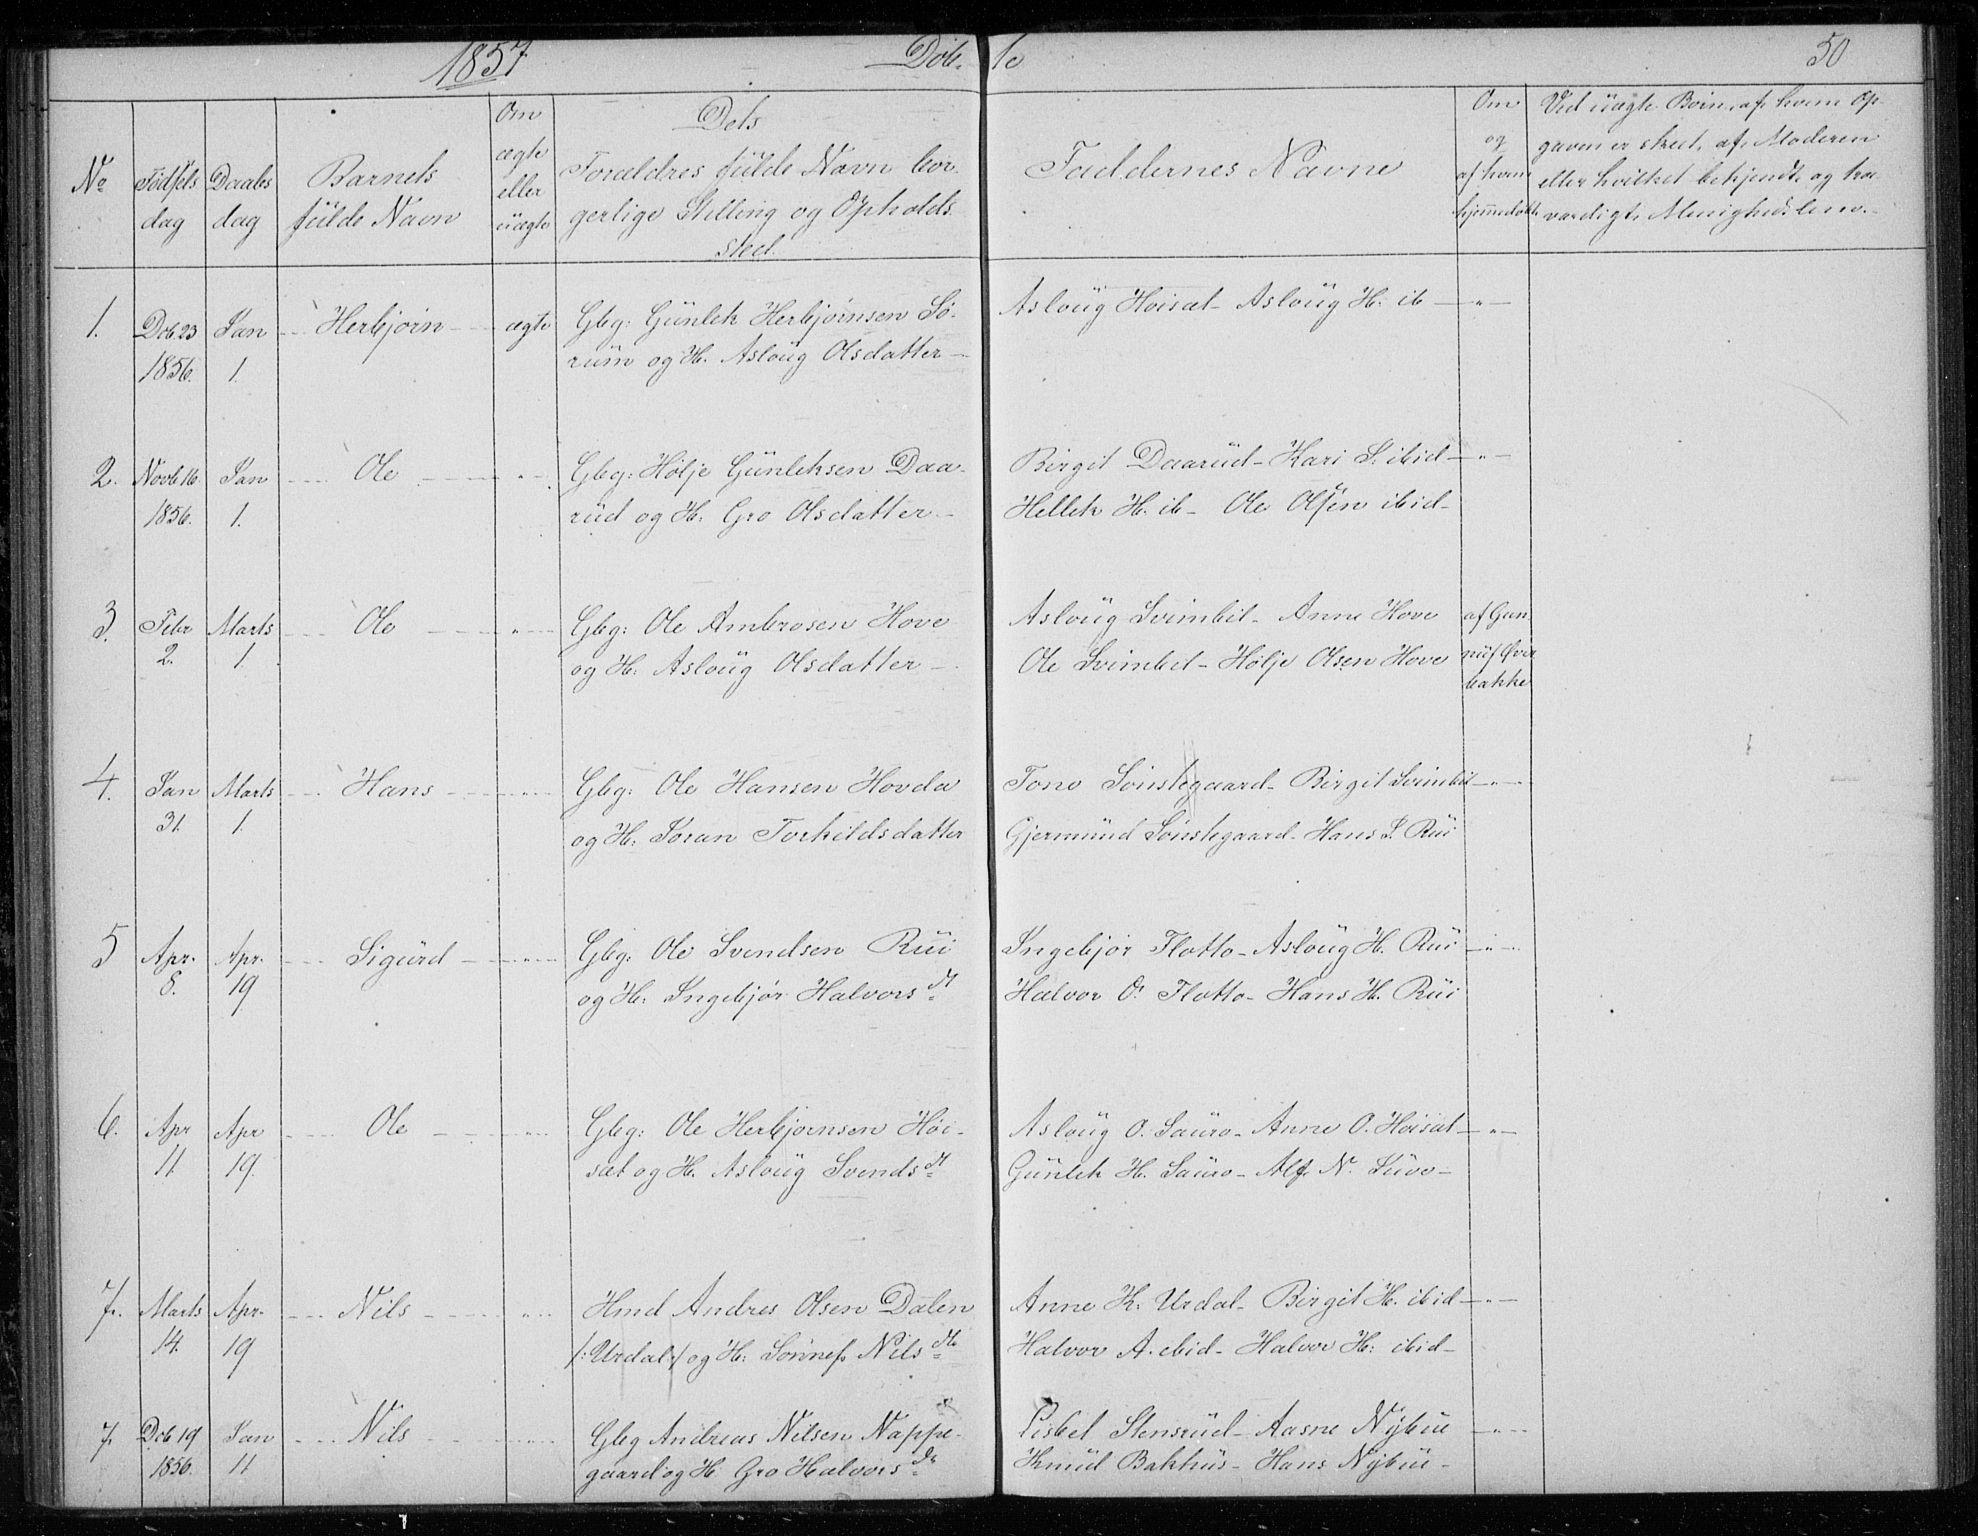 SAKO, Gransherad kirkebøker, F/Fb/L0003: Ministerialbok nr. II 3, 1844-1859, s. 50